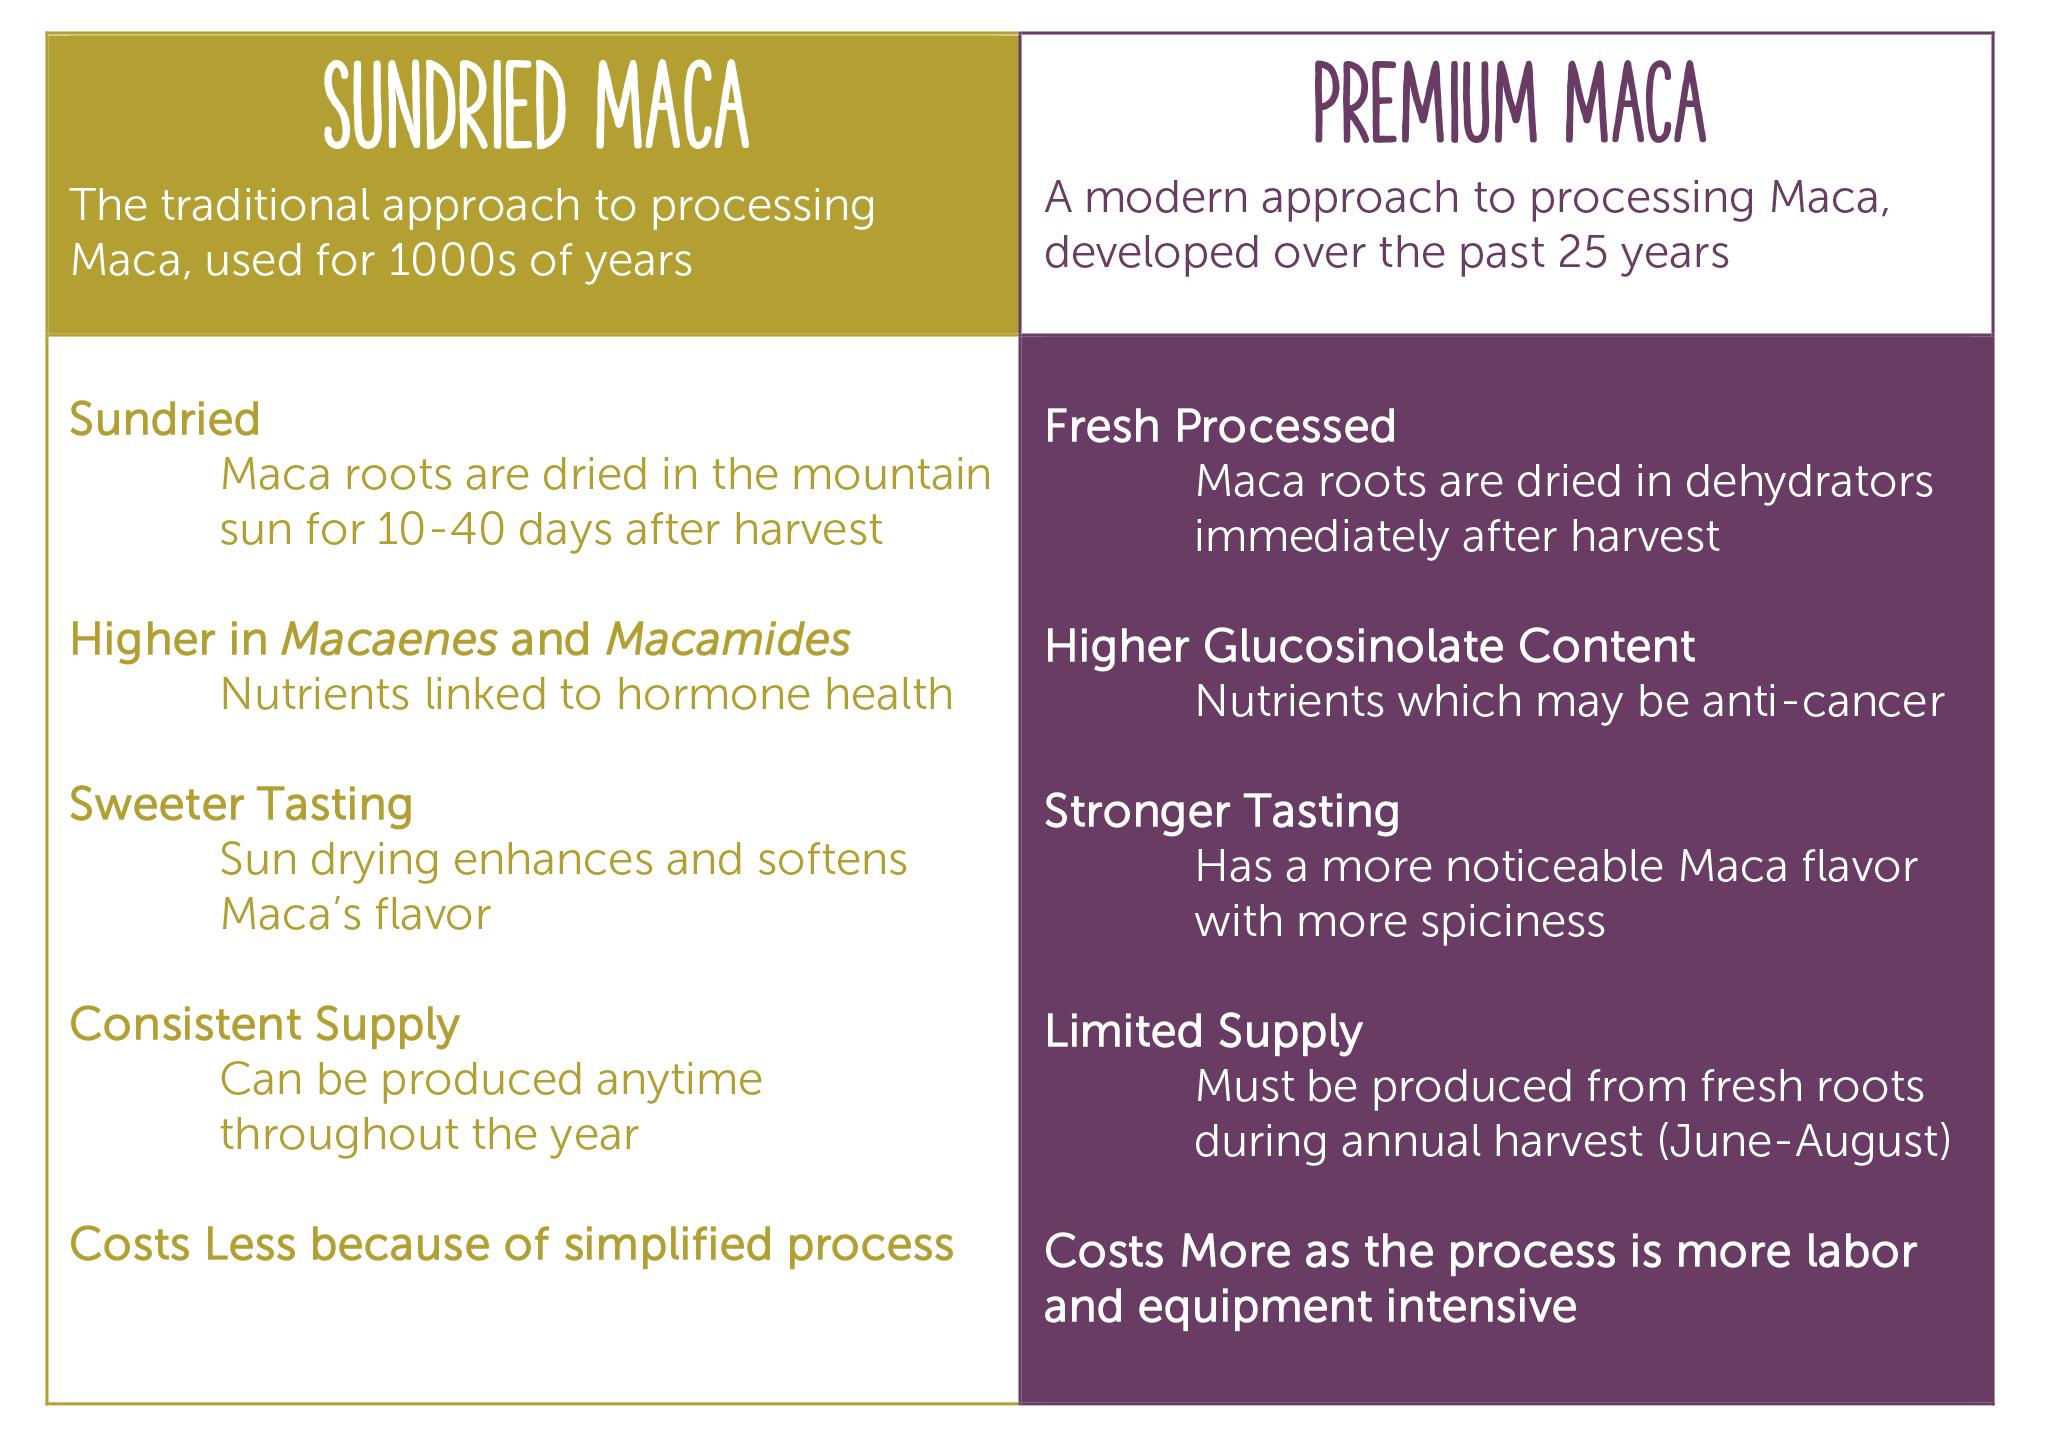 Premium Maca v sundried Maca